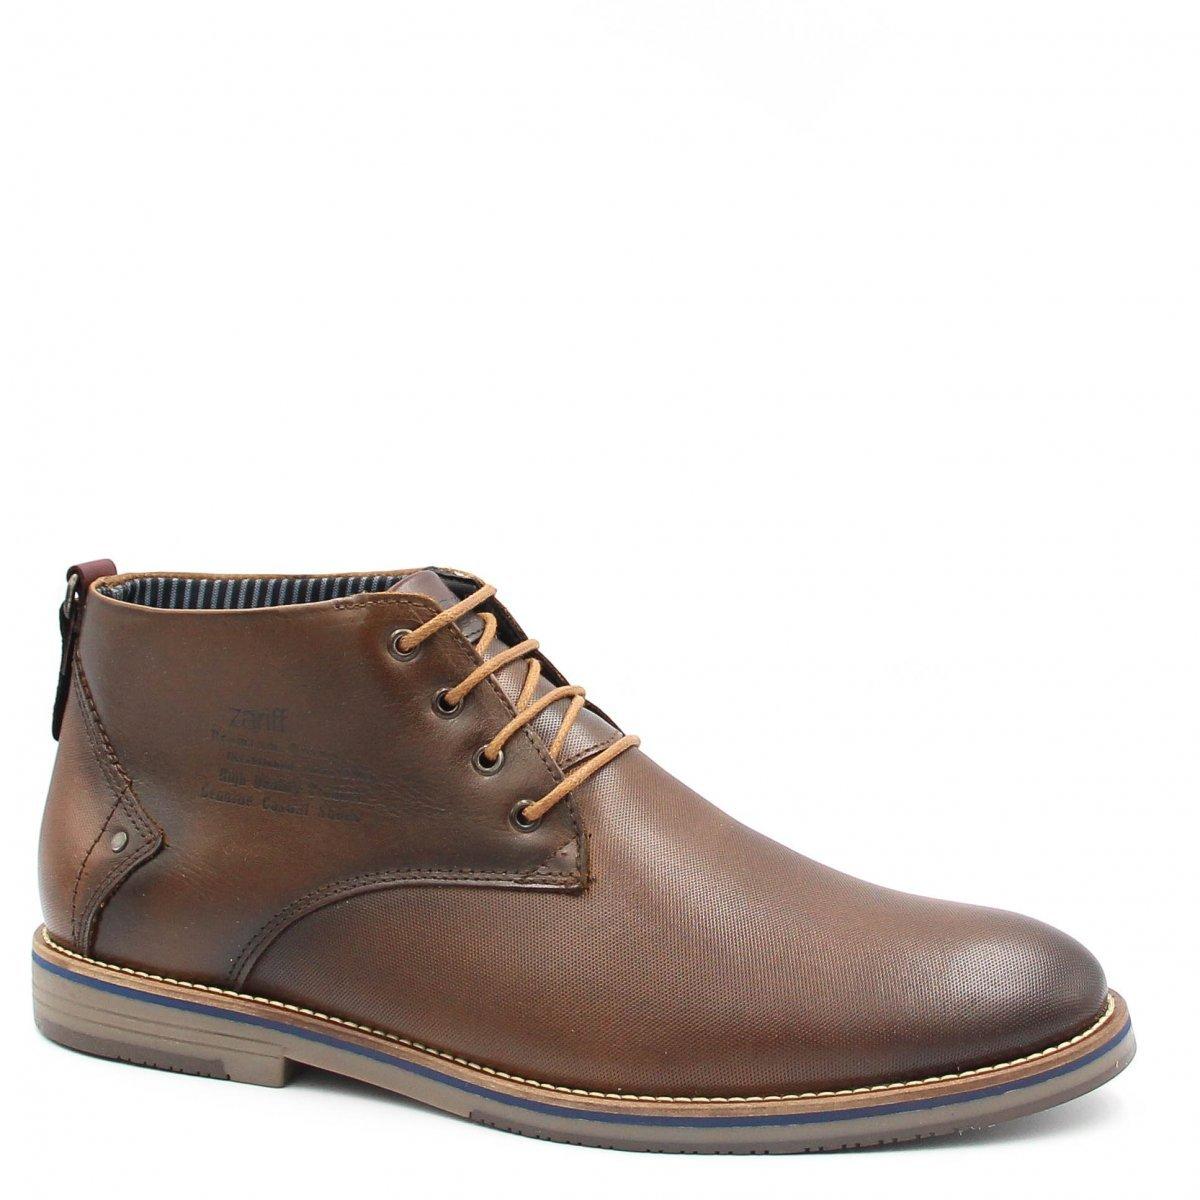 Social Zariff Marrom Shoes Bota Bota Zariff em Masculina Cadarço Couro wRFqIBxEF